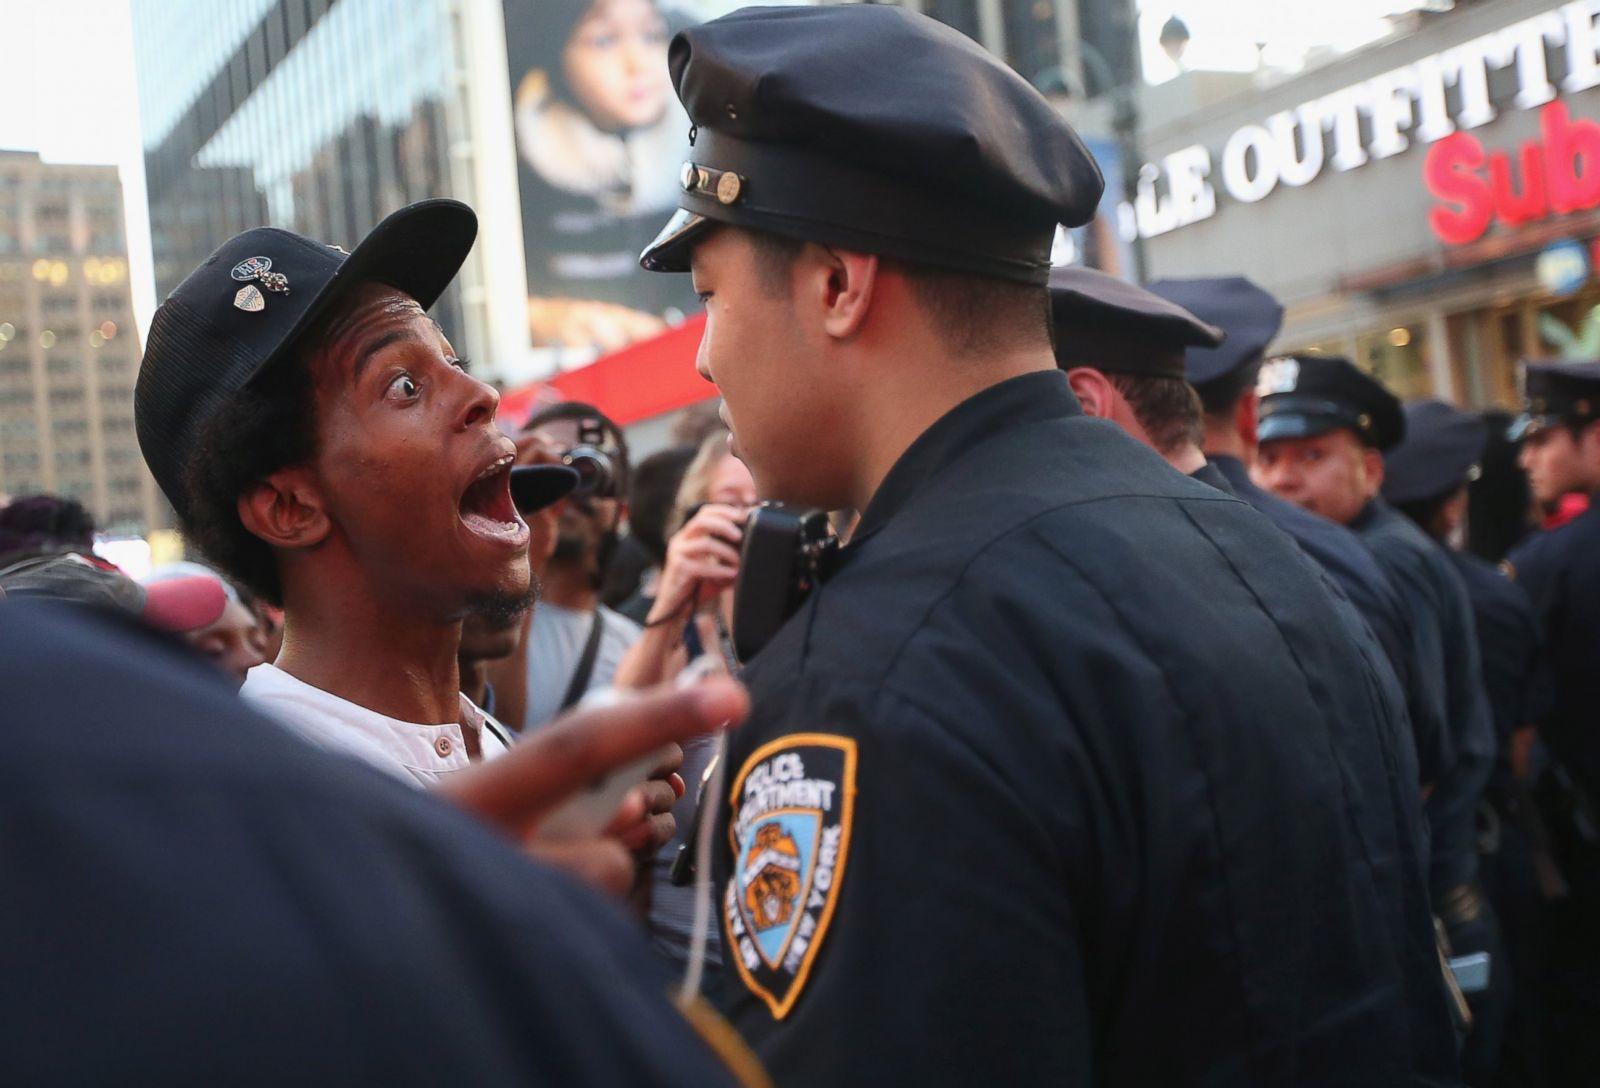 Black Lives Matter: A movement in photos